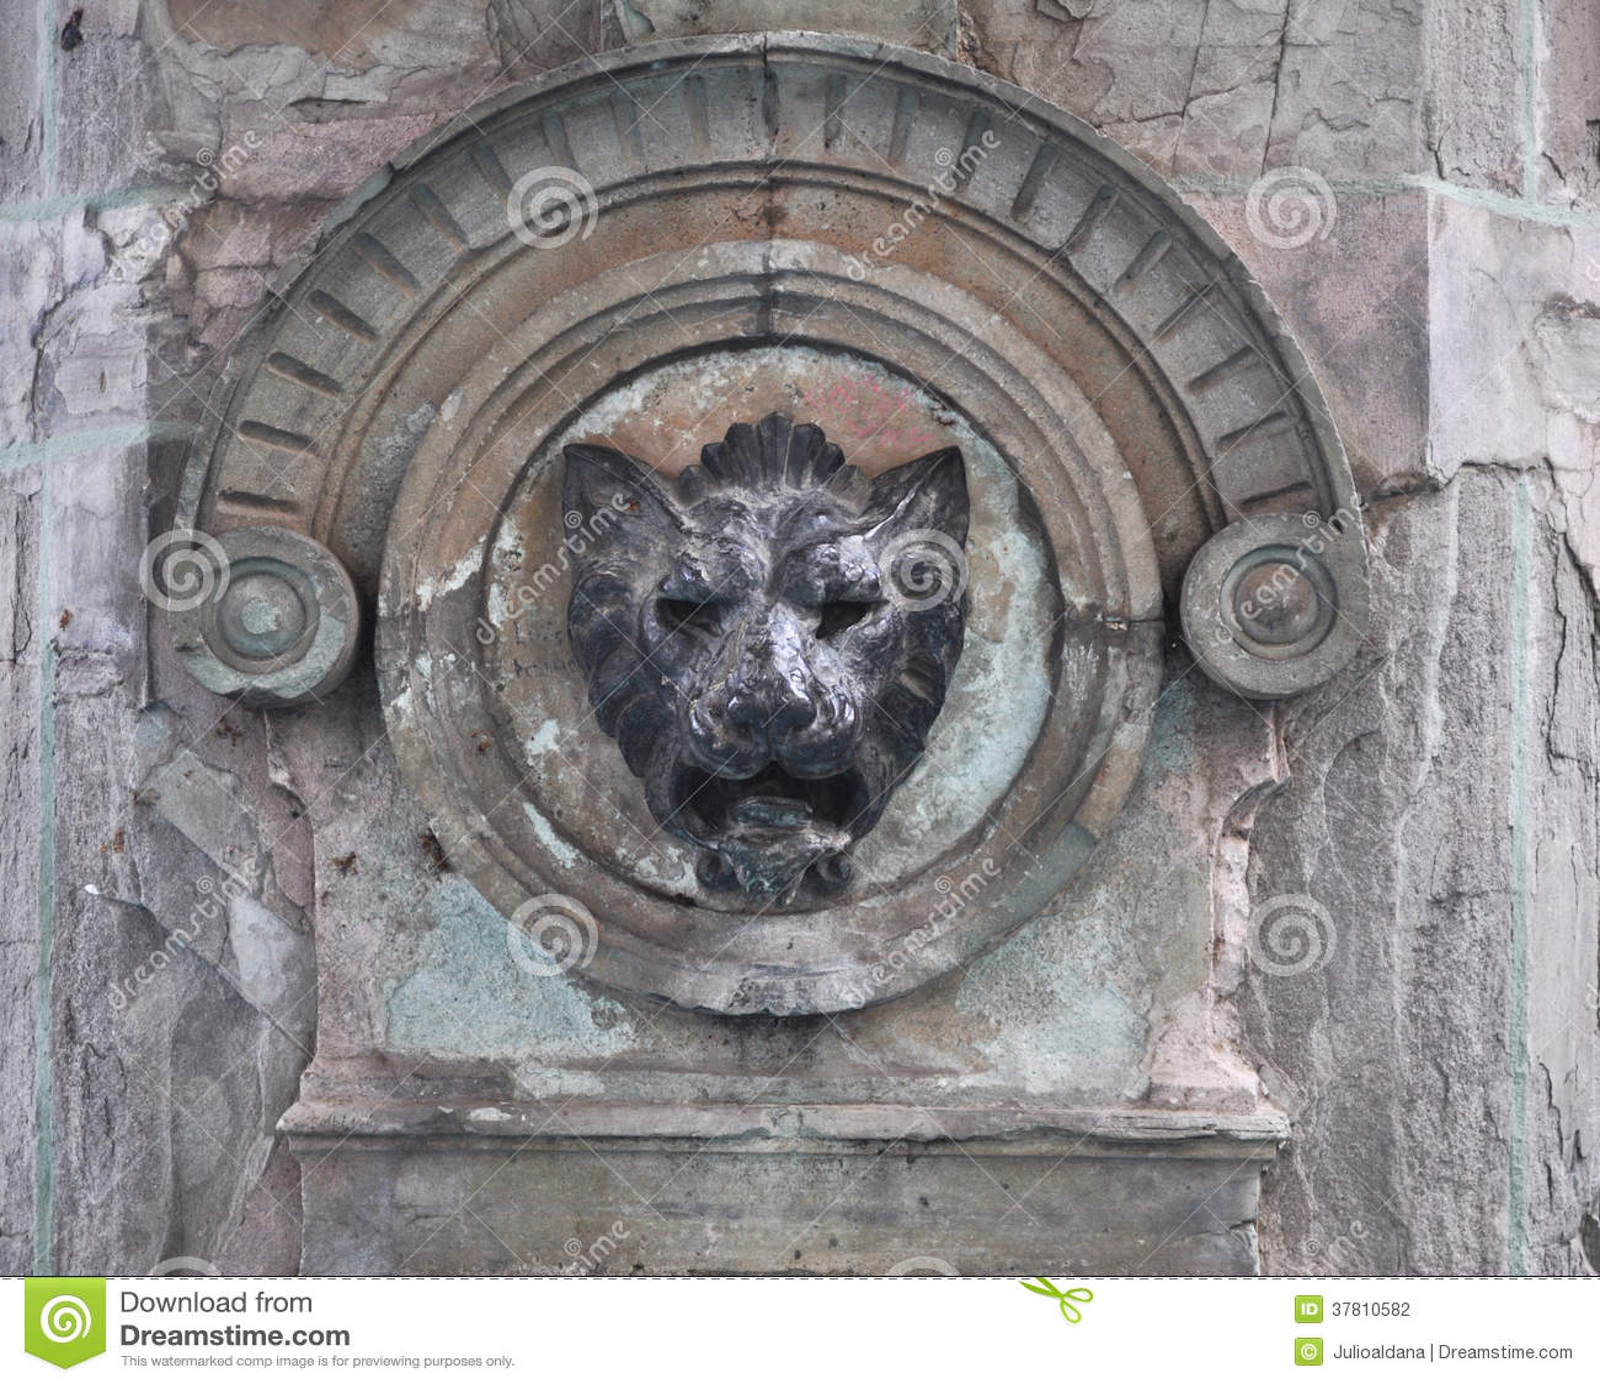 Stone lion head - Mexican fountain decoration